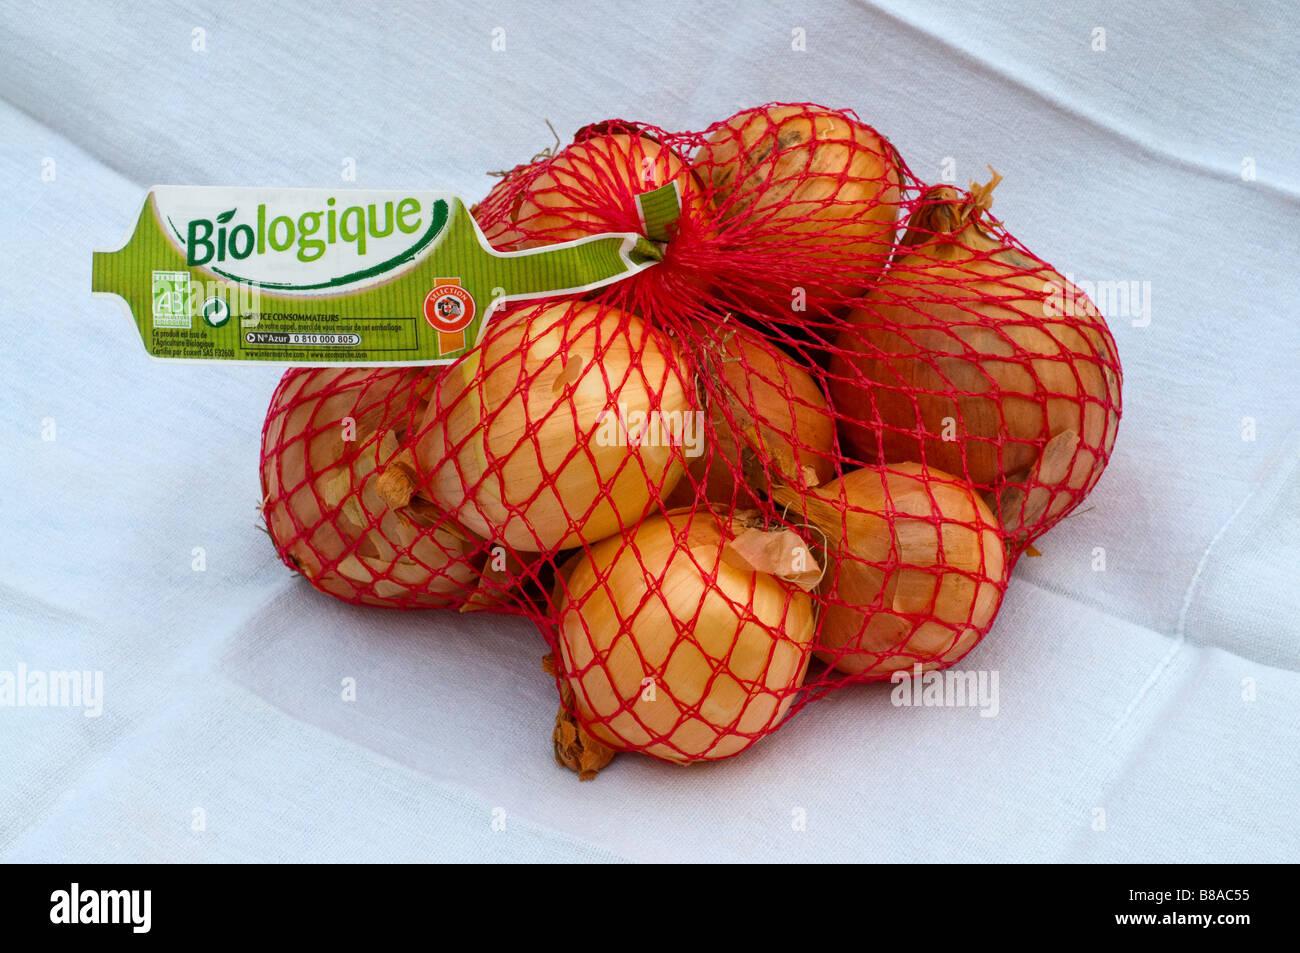 1 kilo sack / net of French Organic / Biologique onions. - Stock Image